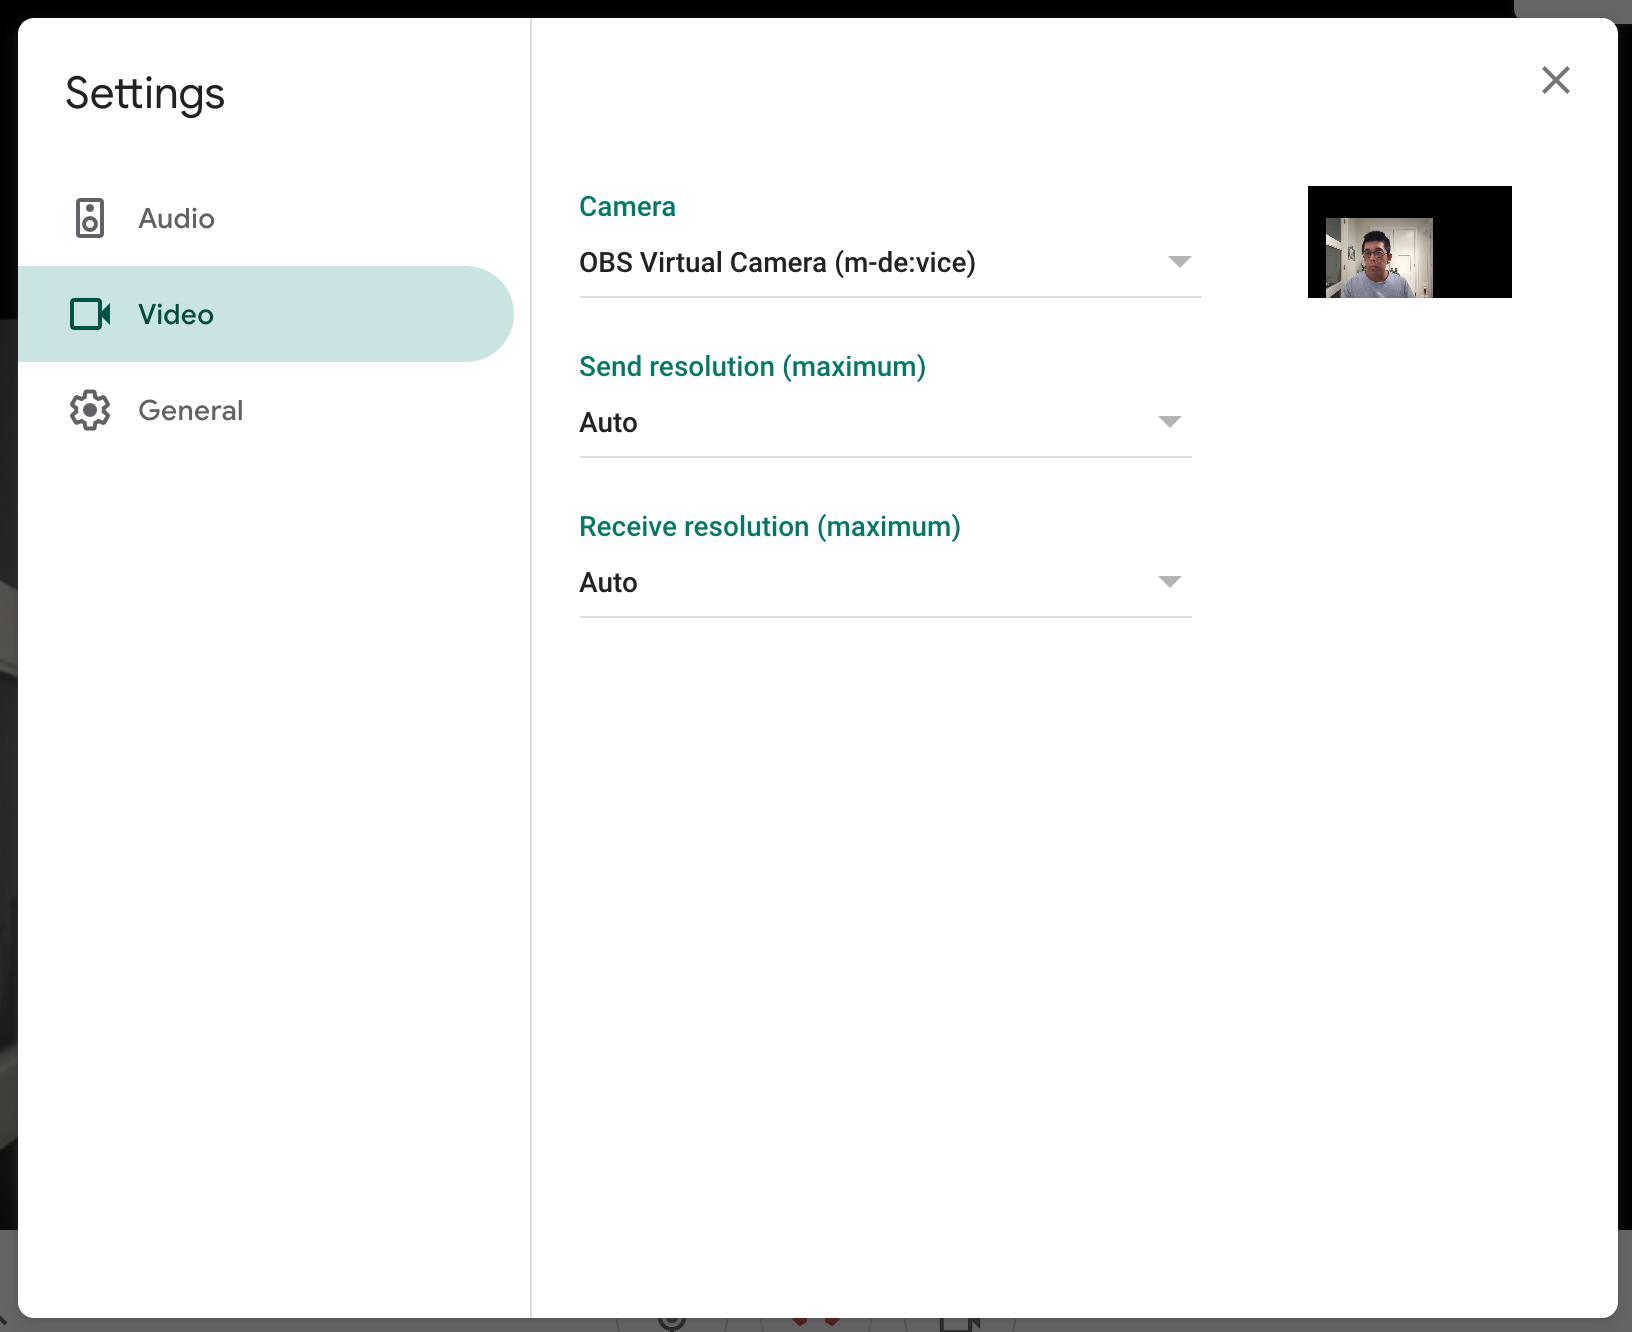 Selecting OBS Virtual Camera as the Camera in Google Meet Video settings